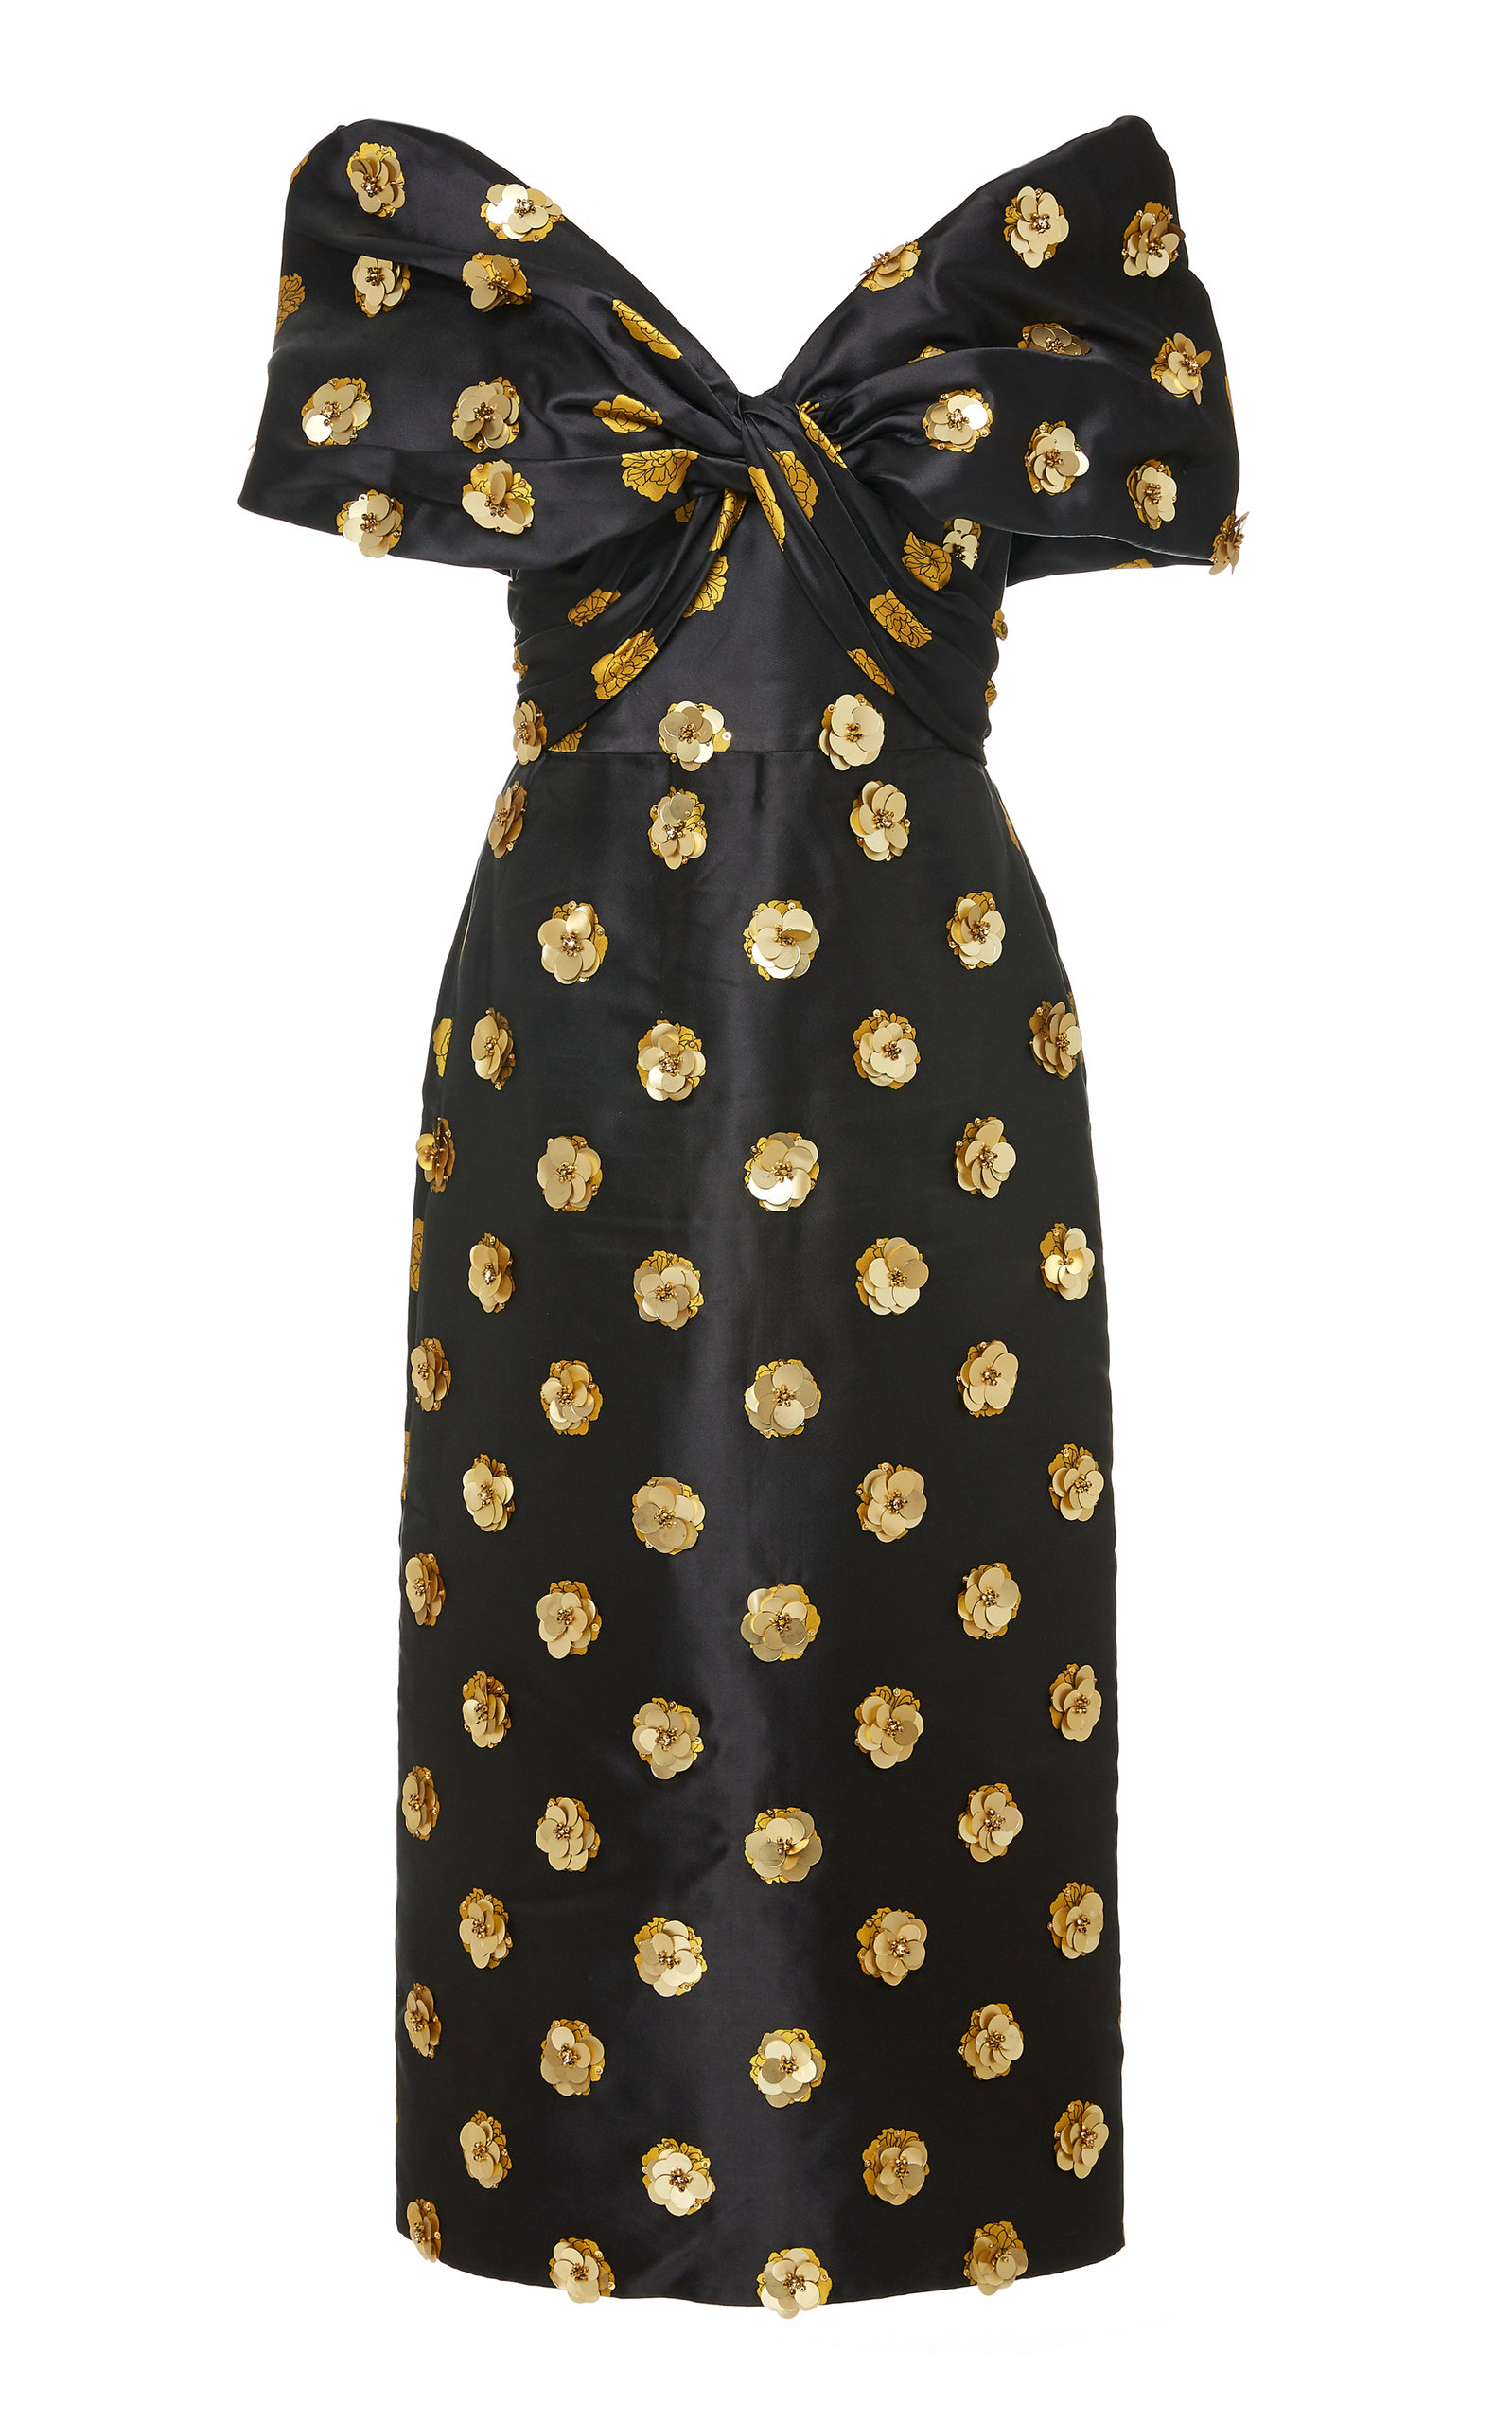 Buy Johanna Ortiz Exclusive Golden Phase Embellished Taffeta Dress online, shop Johanna Ortiz at the best price